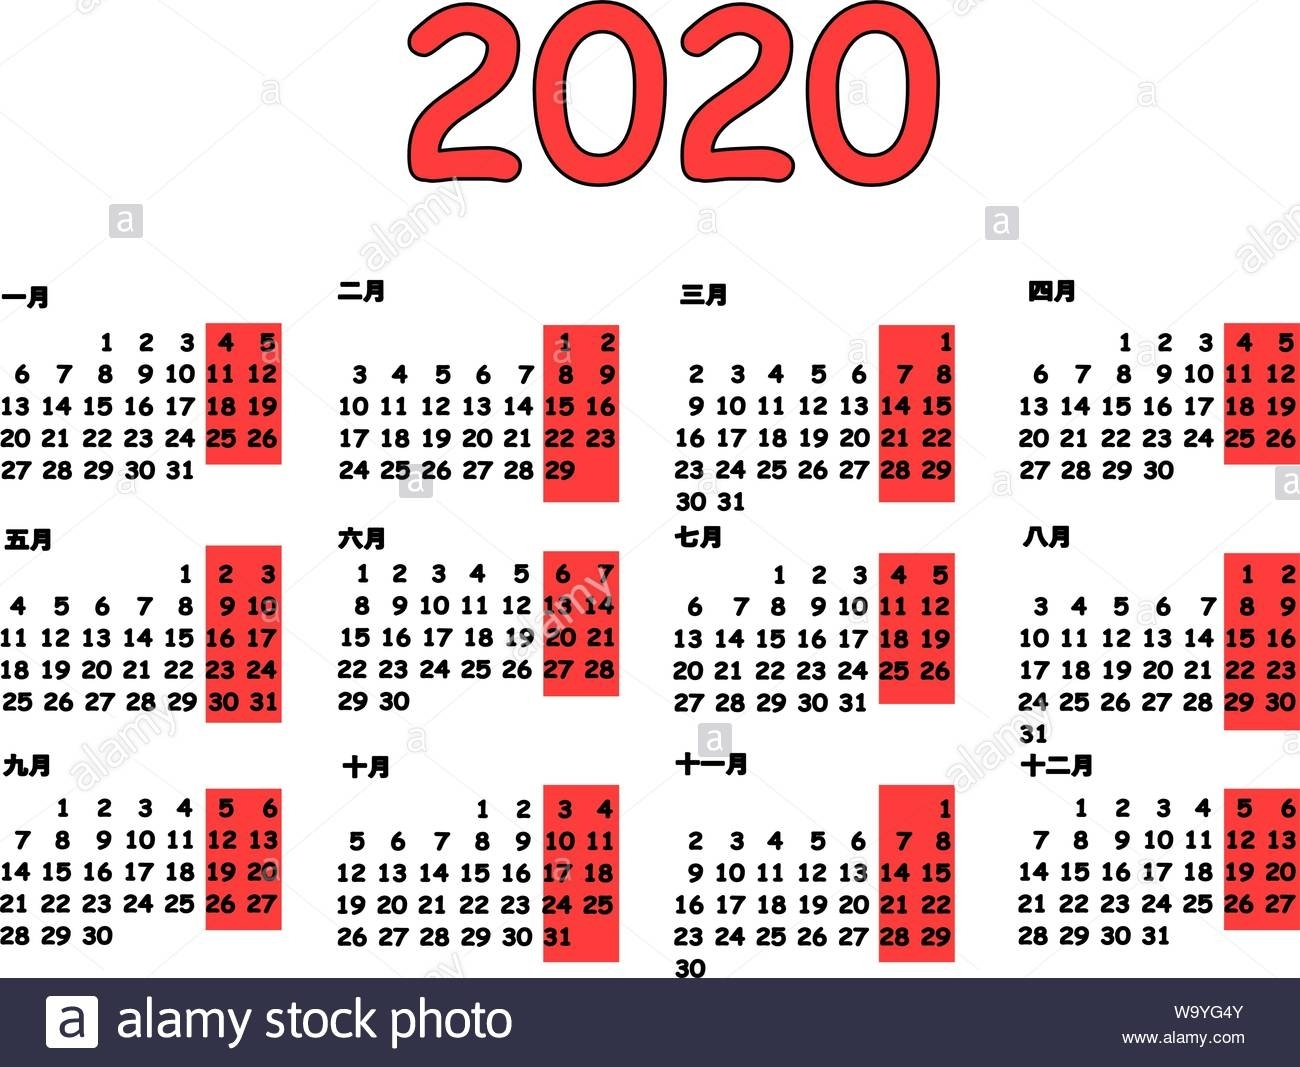 Chinese Language Calendar Stock Photos & Chinese Language